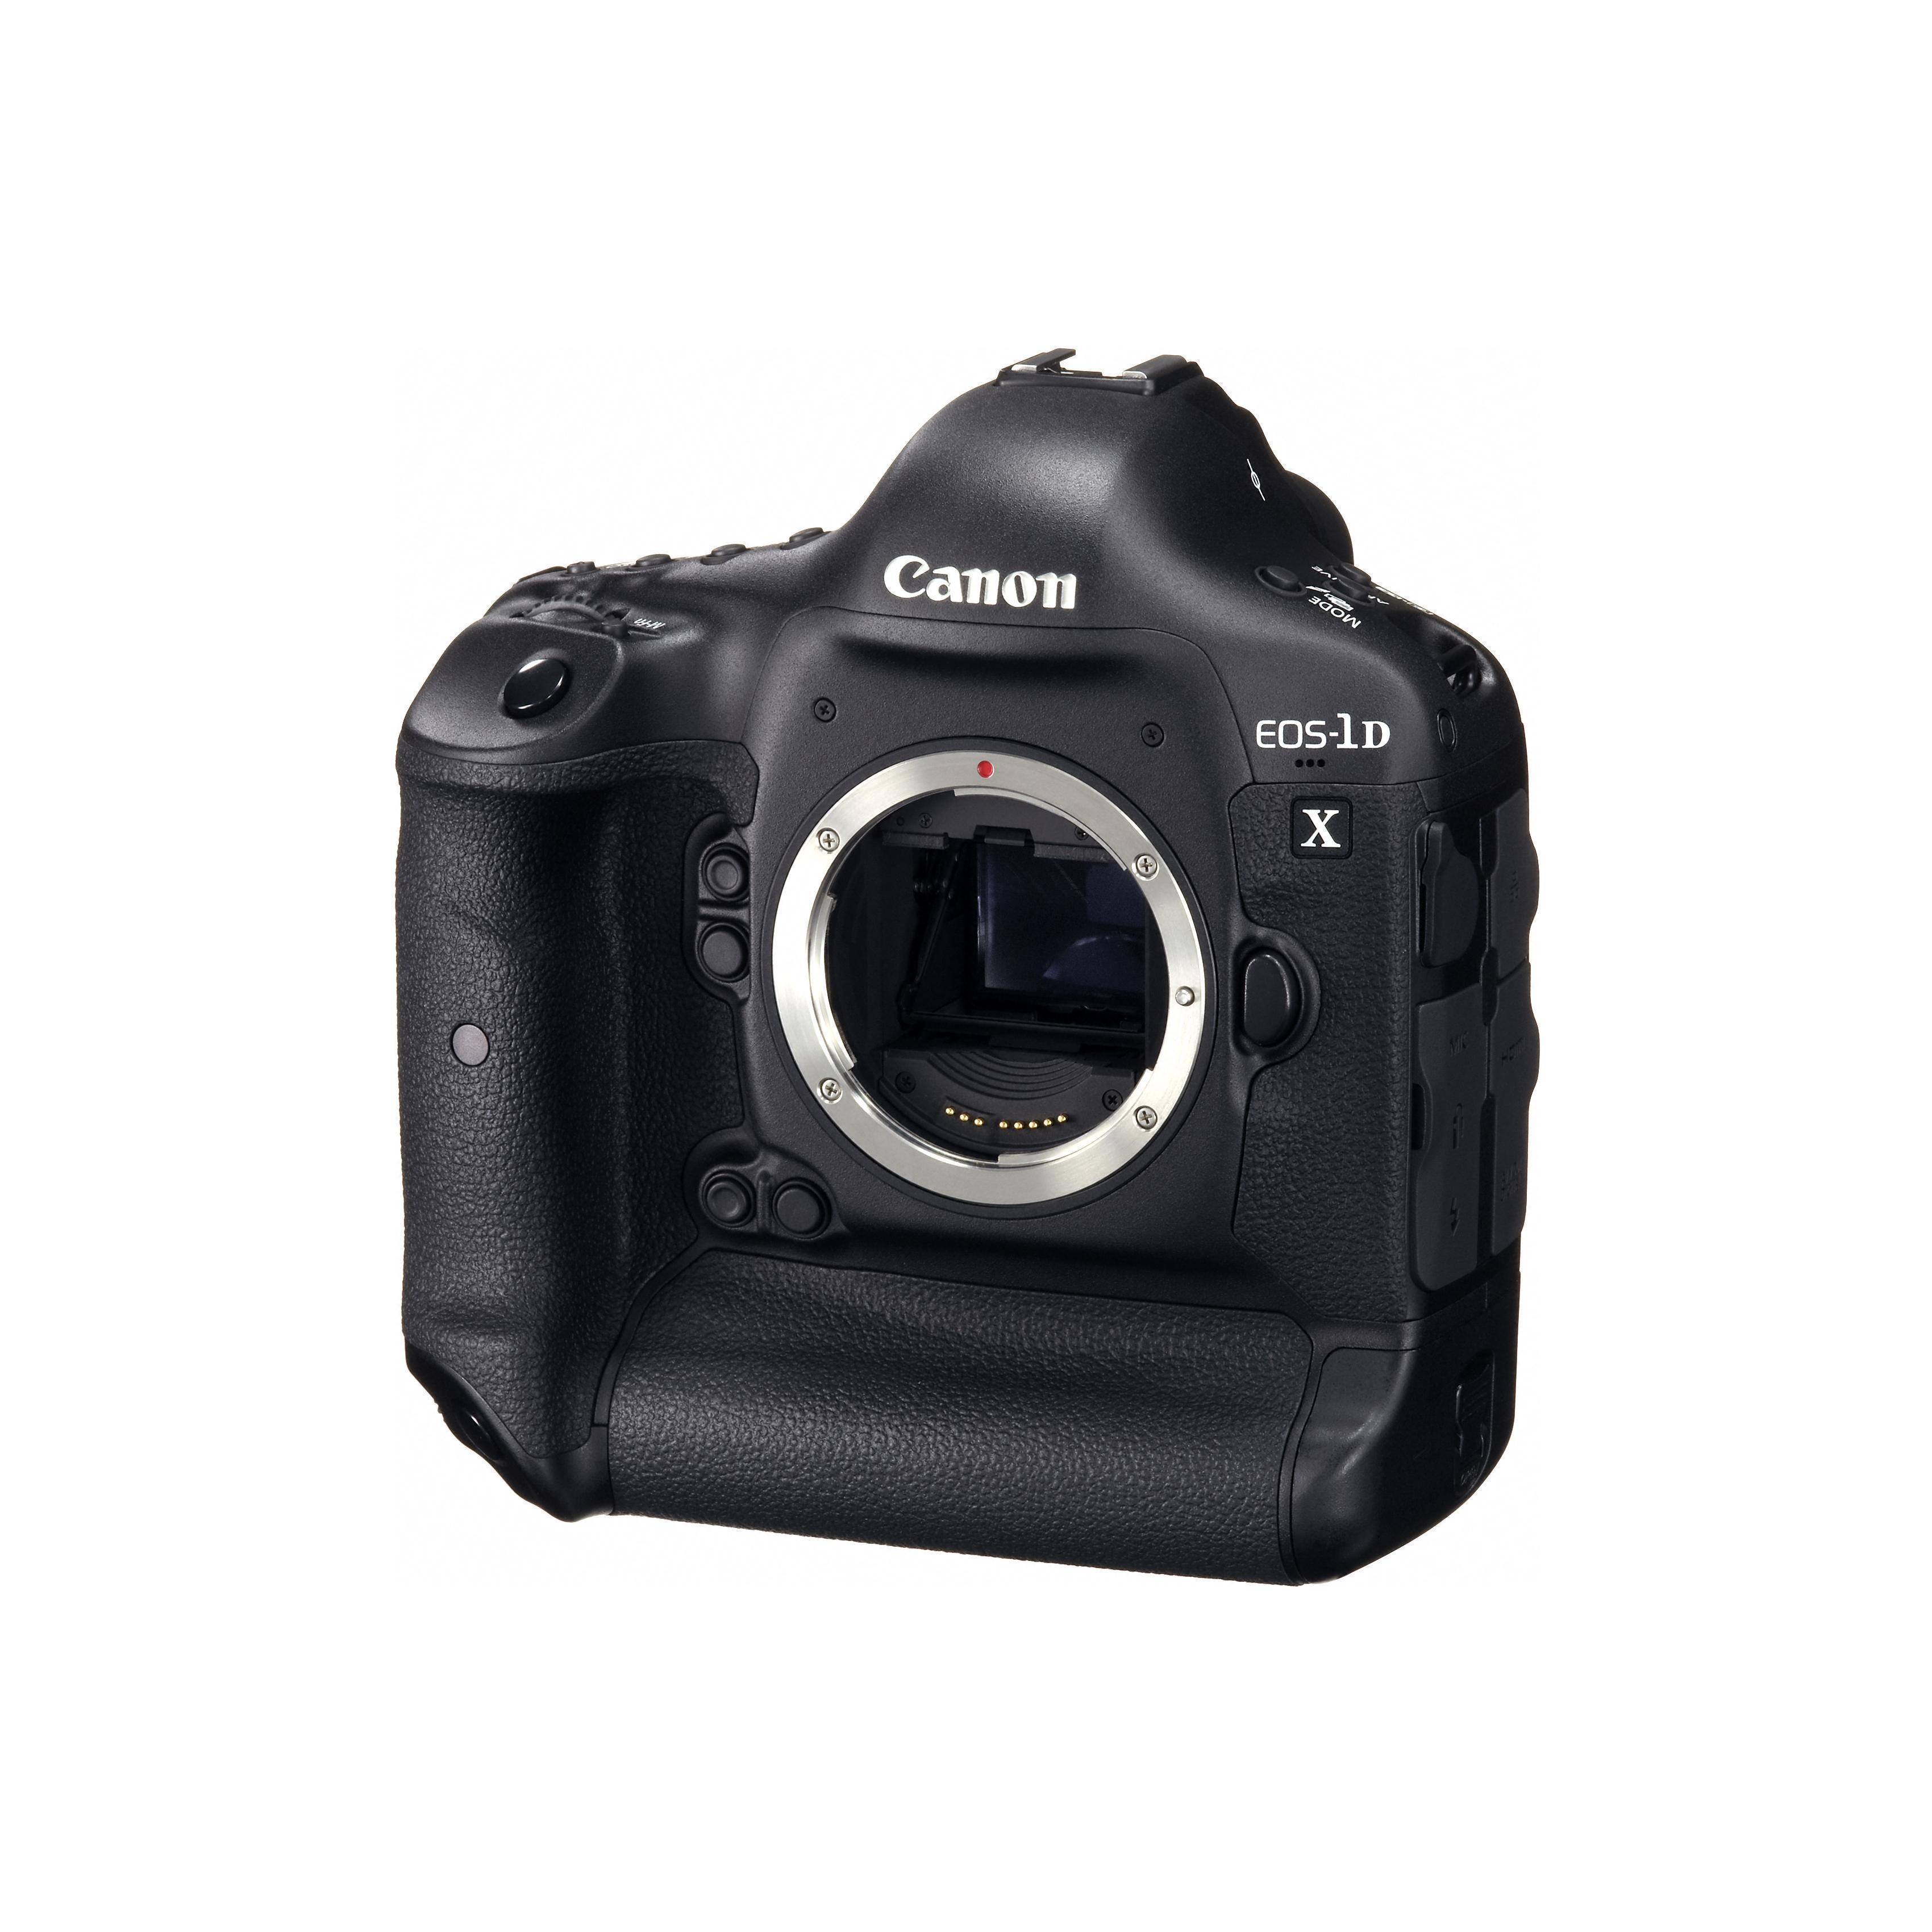 Réflex - Canon EOS 1D X Sin objetivo